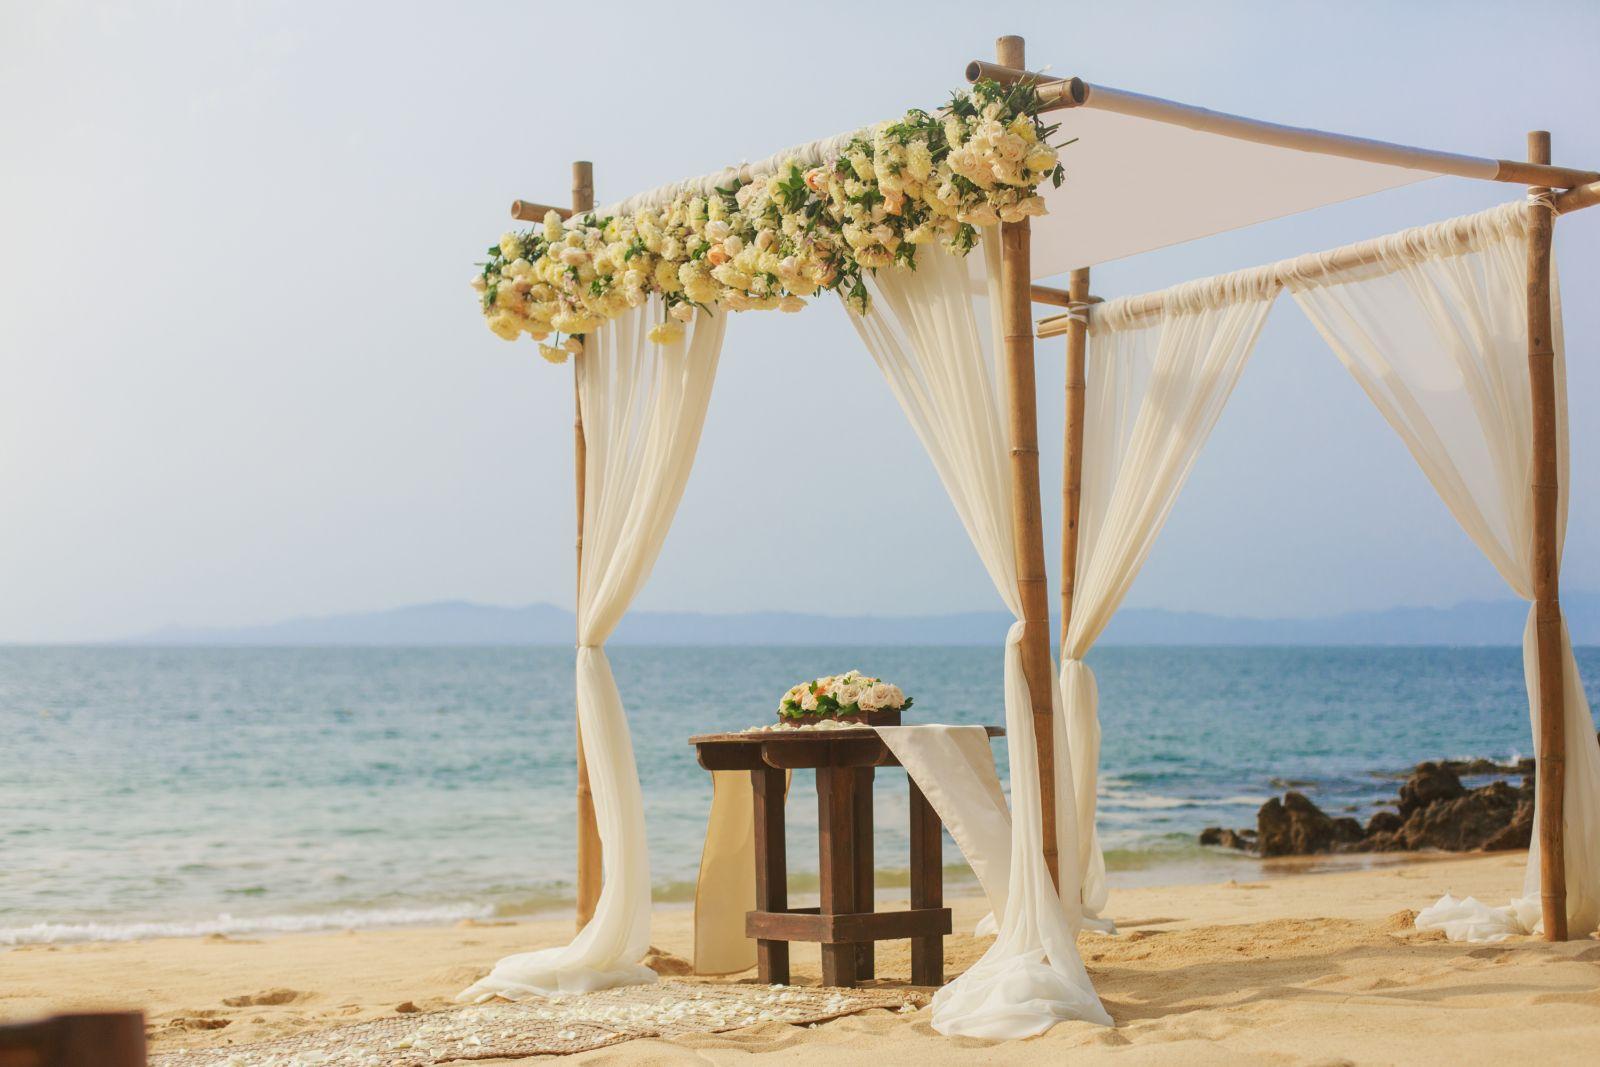 K&J lasCaletas, Trendy style for a beach wedding